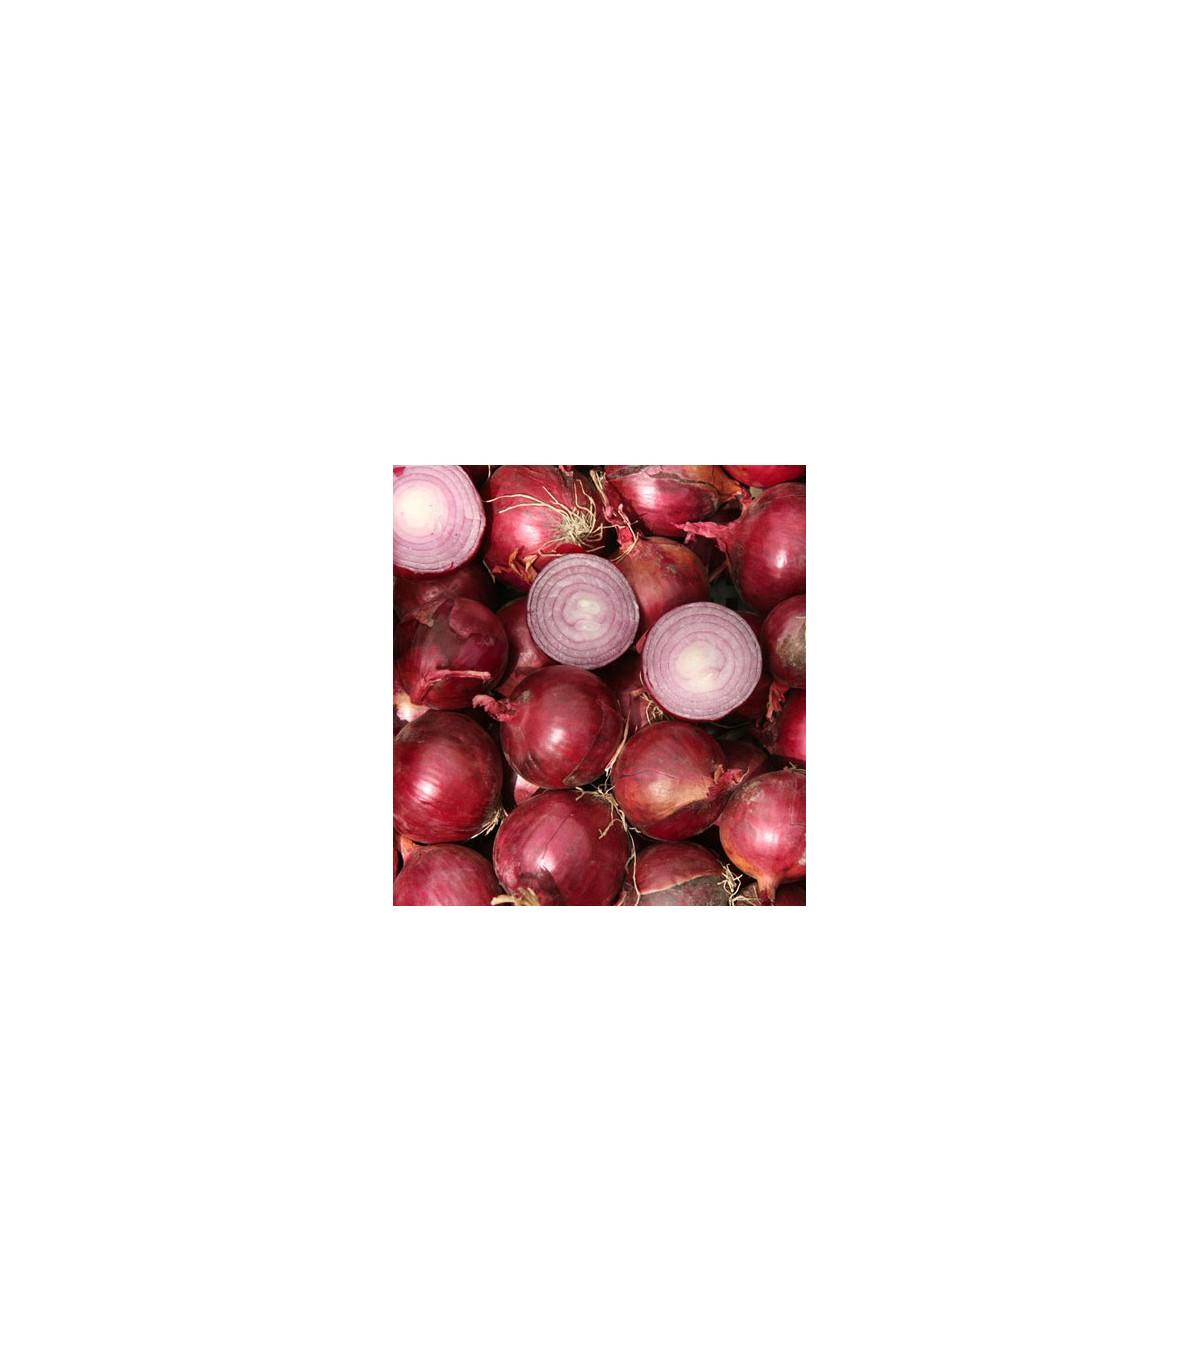 Cibule Červený baron - Allium cepa L. - prodej osiva cibule - 0,08 gr